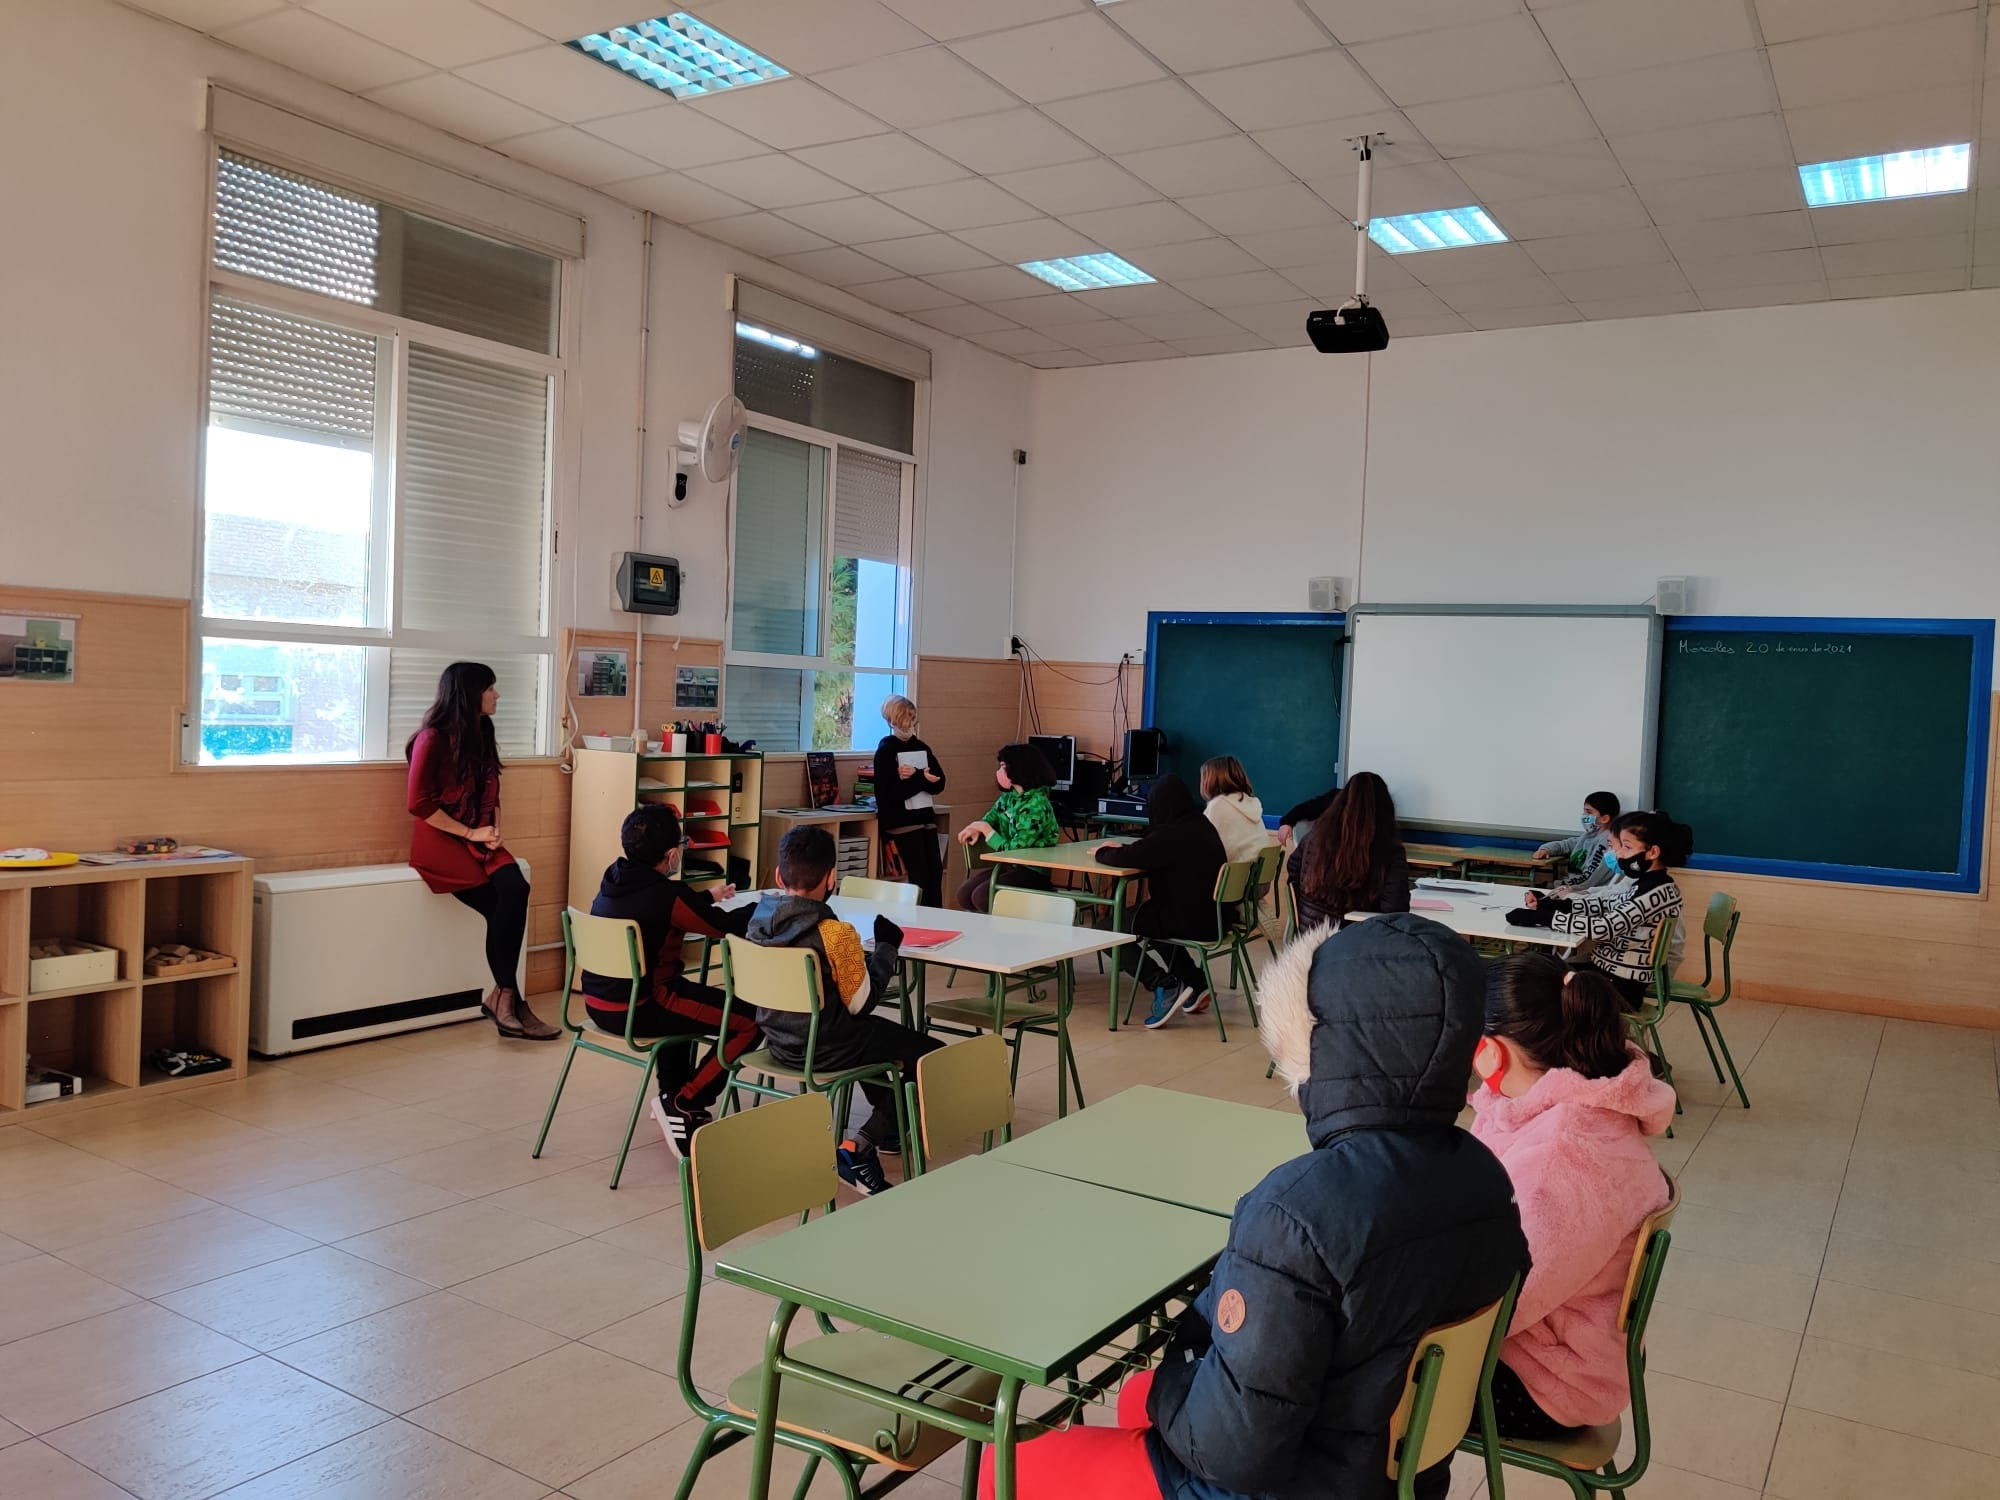 CEIP Felciiano Sánchez Fase 1 Foto 4